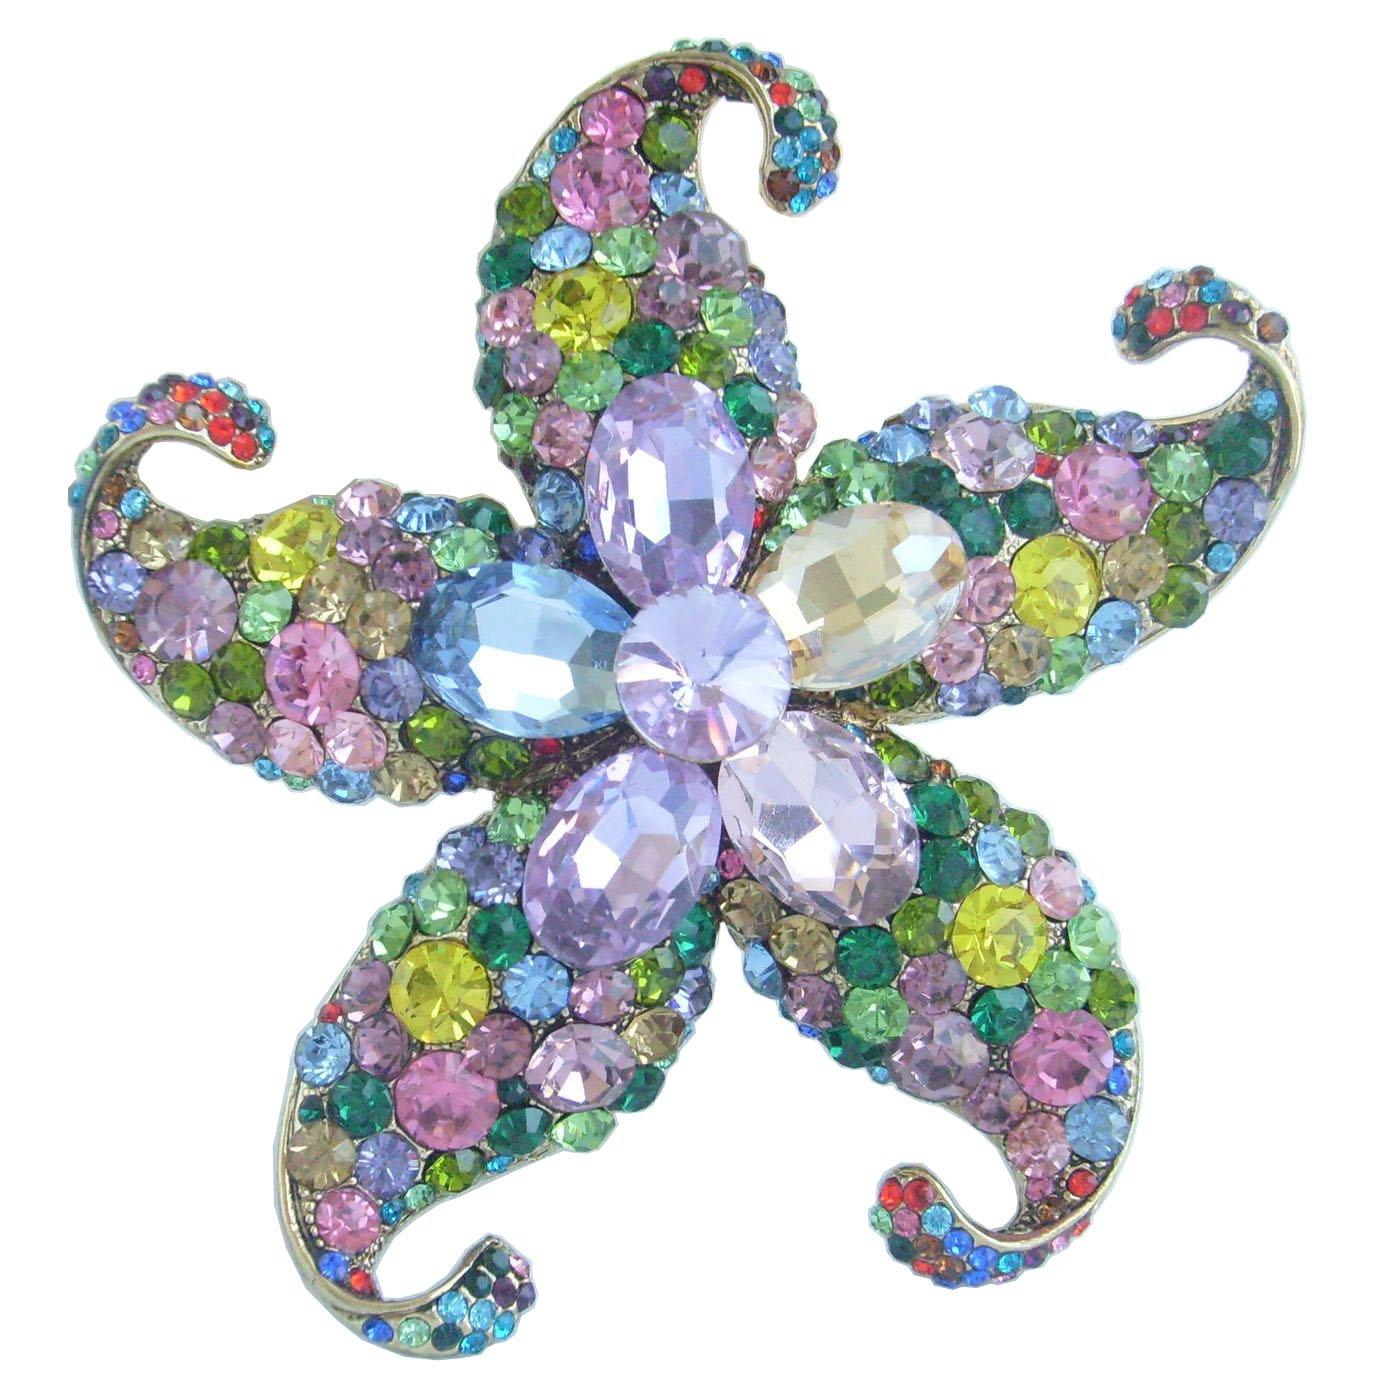 Sindary Charming 3.15'' Austrian Crystal Starfish Brooch Pin Pendant BZ4824 (Gold-Tone Multicolor)